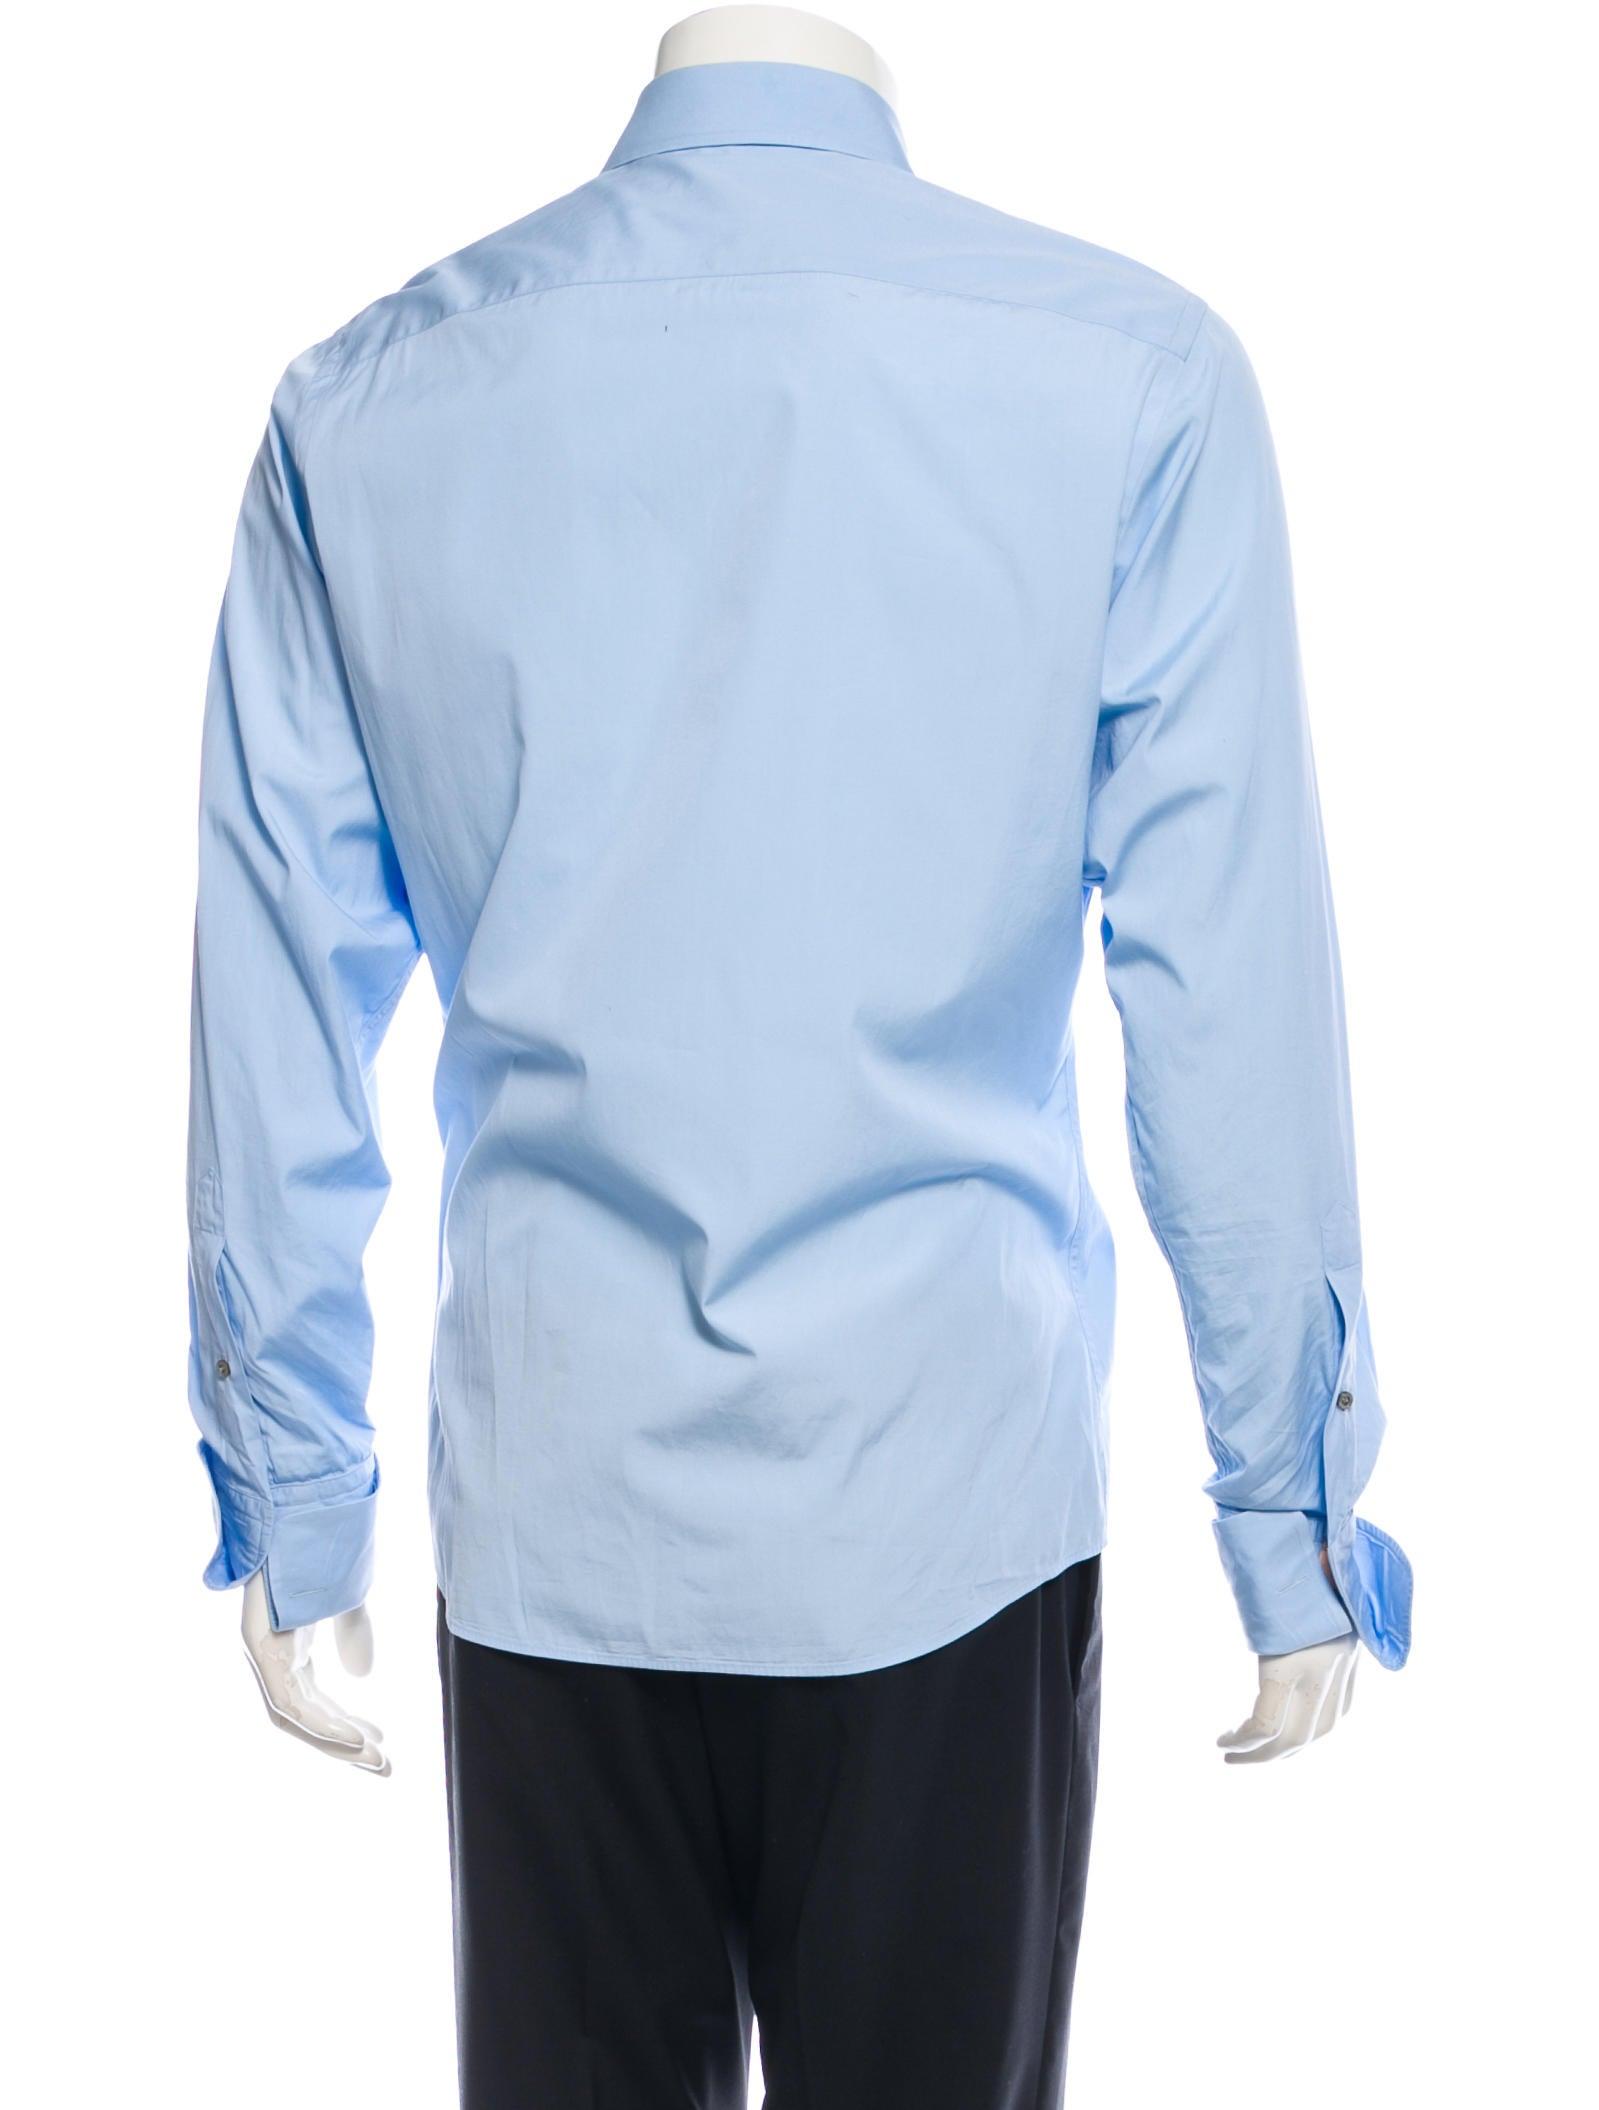 Gucci Long Sleeve Button Up Shirt Clothing Guc76735